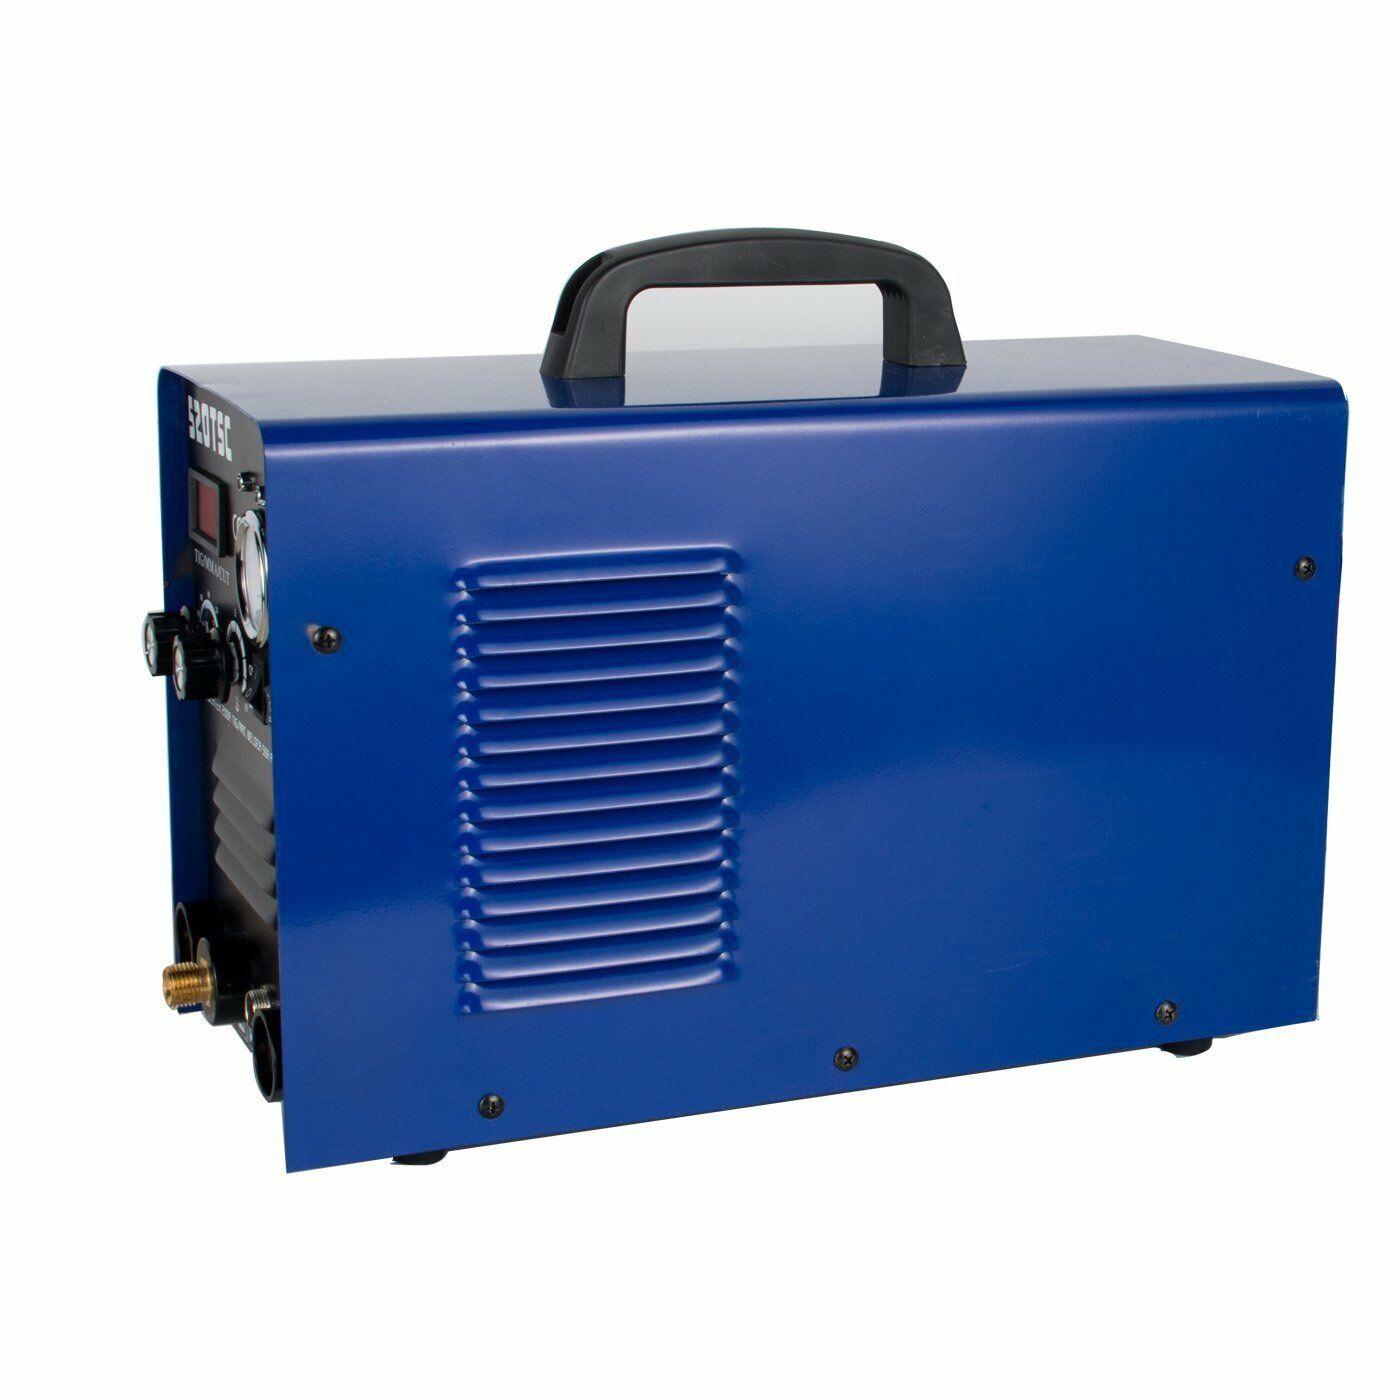 Plasma Cutter Welder Maschine Schweißen 3 Funktionen 520TSC TIG/MMA/CUT 110/220V 50A 3 in 1 Air Inverter Plasma Cutt Multi-Funktion